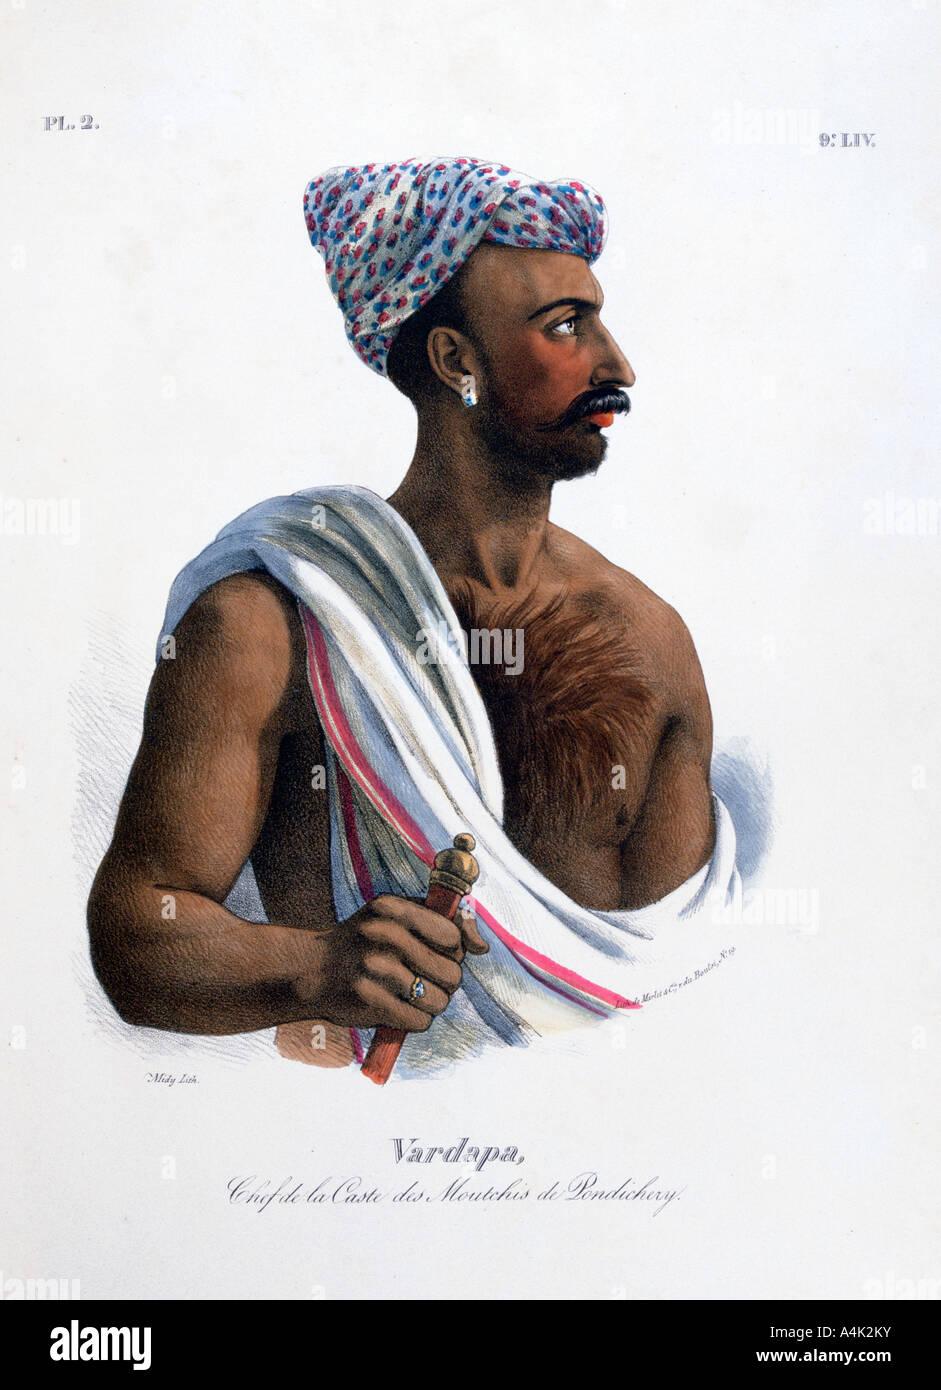 Chief of the Caste in Pondicherry Puducherry India 1828  - Stock Image